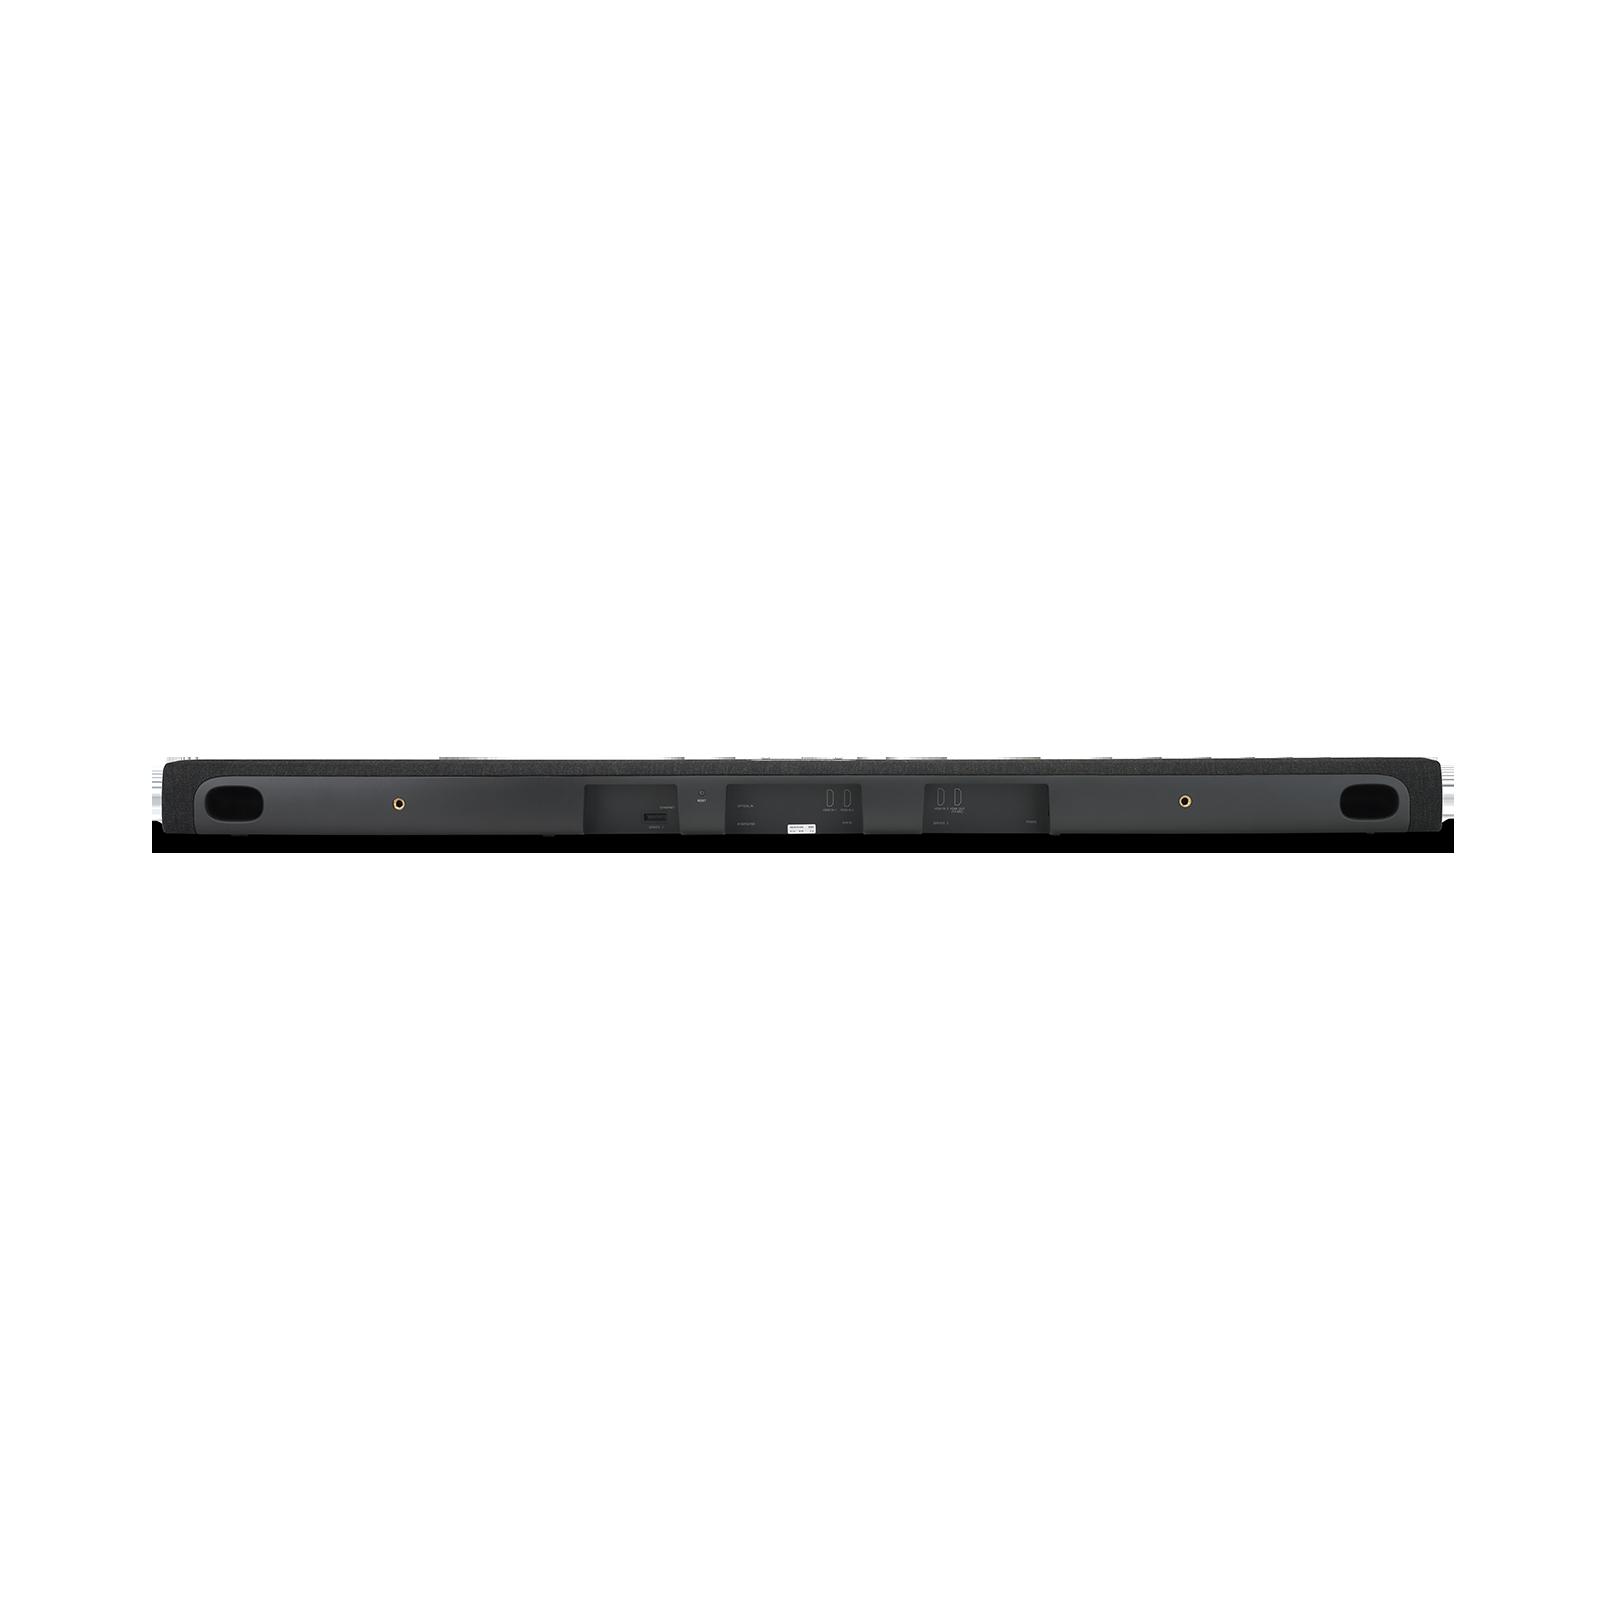 Harman Kardon Citation Bar - Black - The smartest soundbar for movies and music - Back